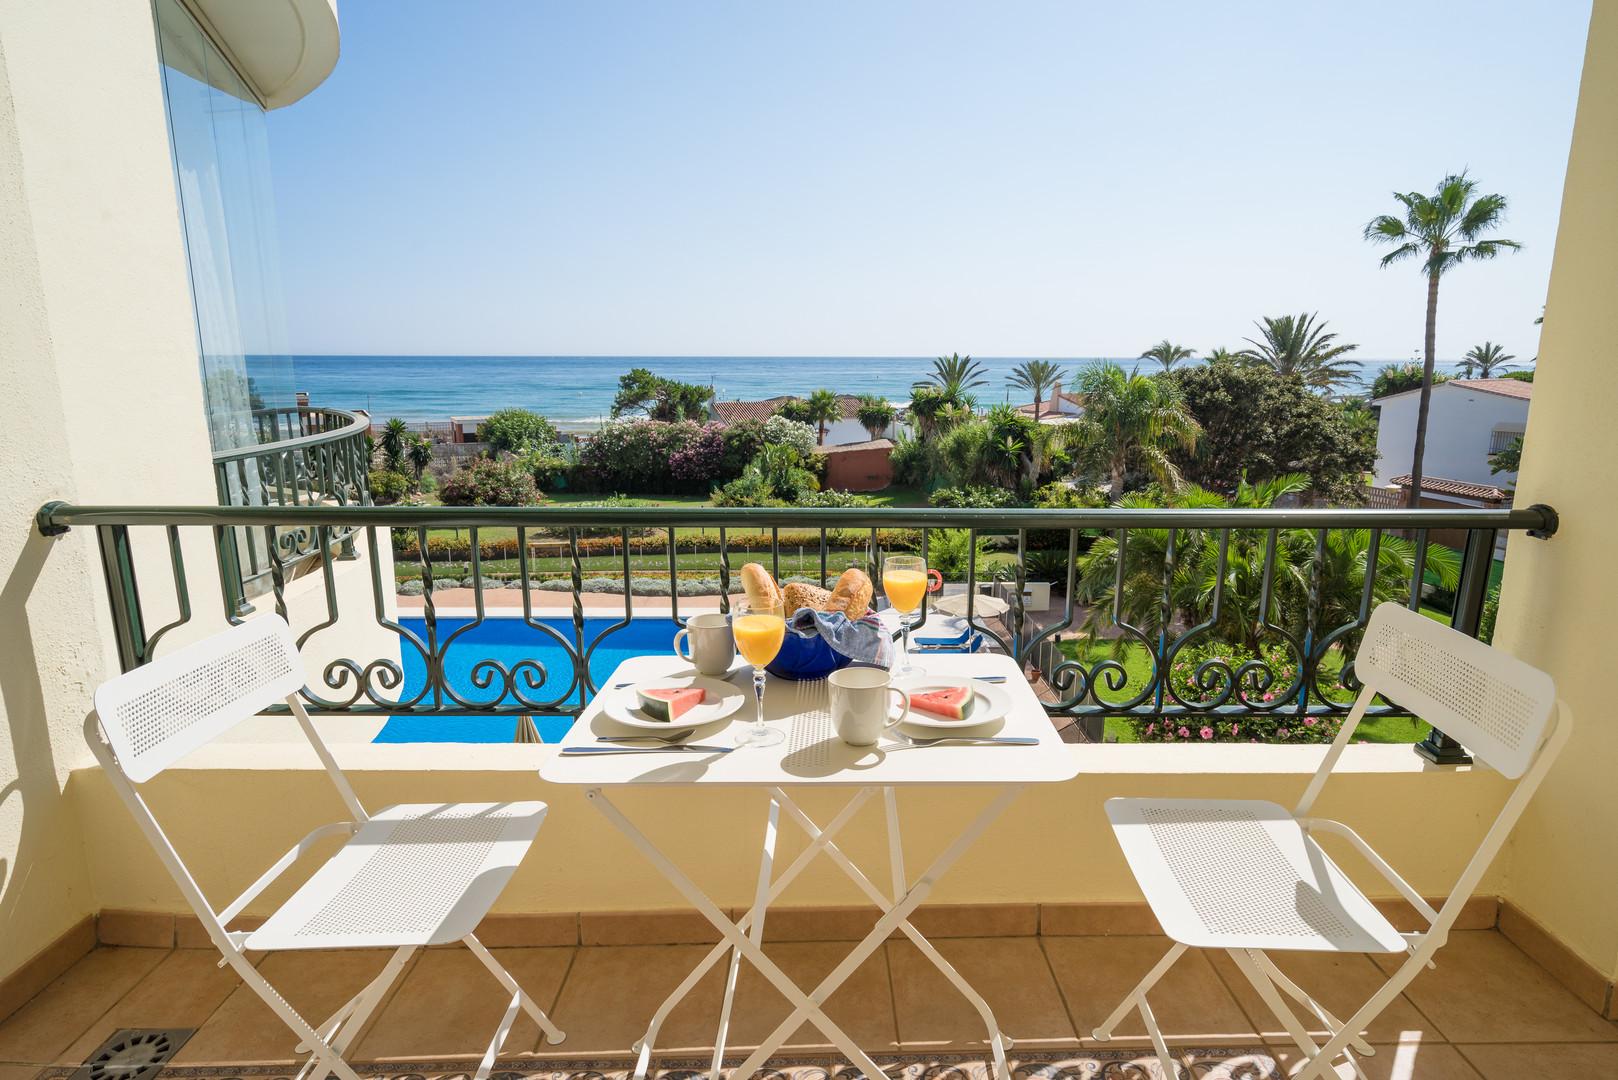 w54 breakfast beach next to Mariott.jpg